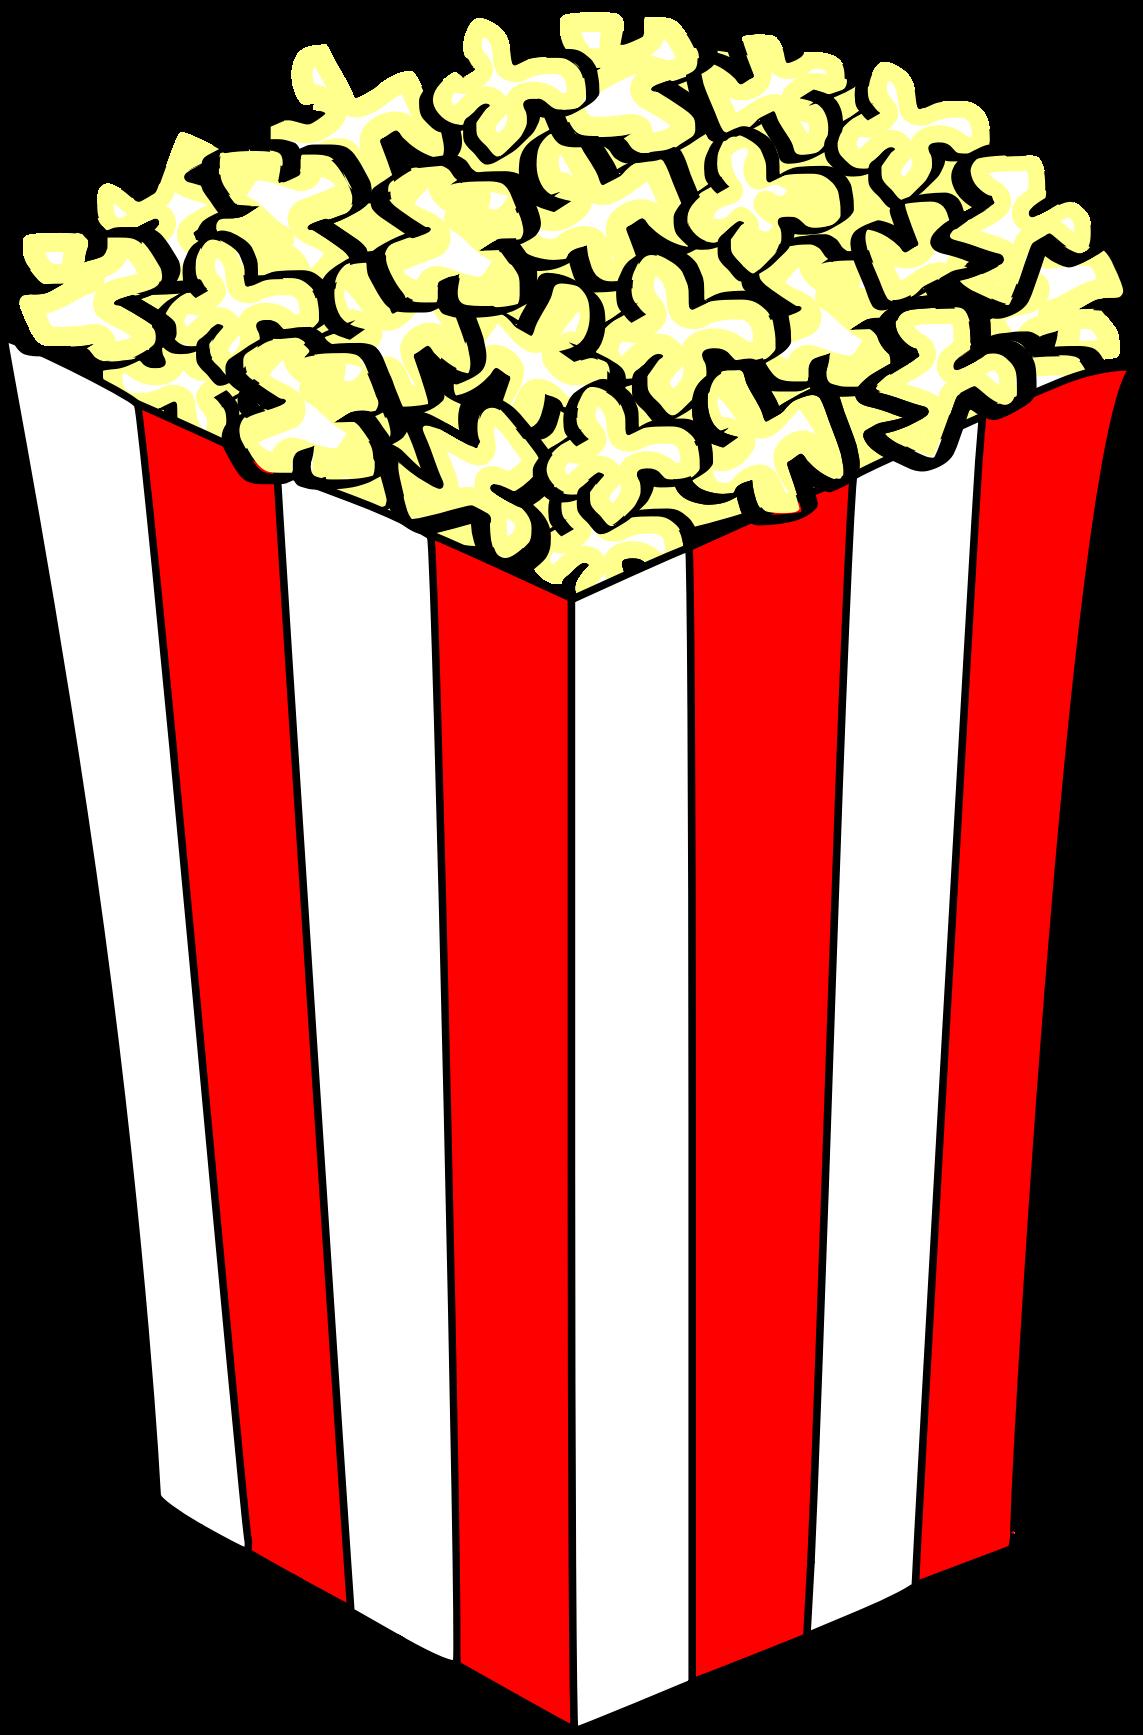 Popcorn clipart kid Popcorn box box clipart popcorn